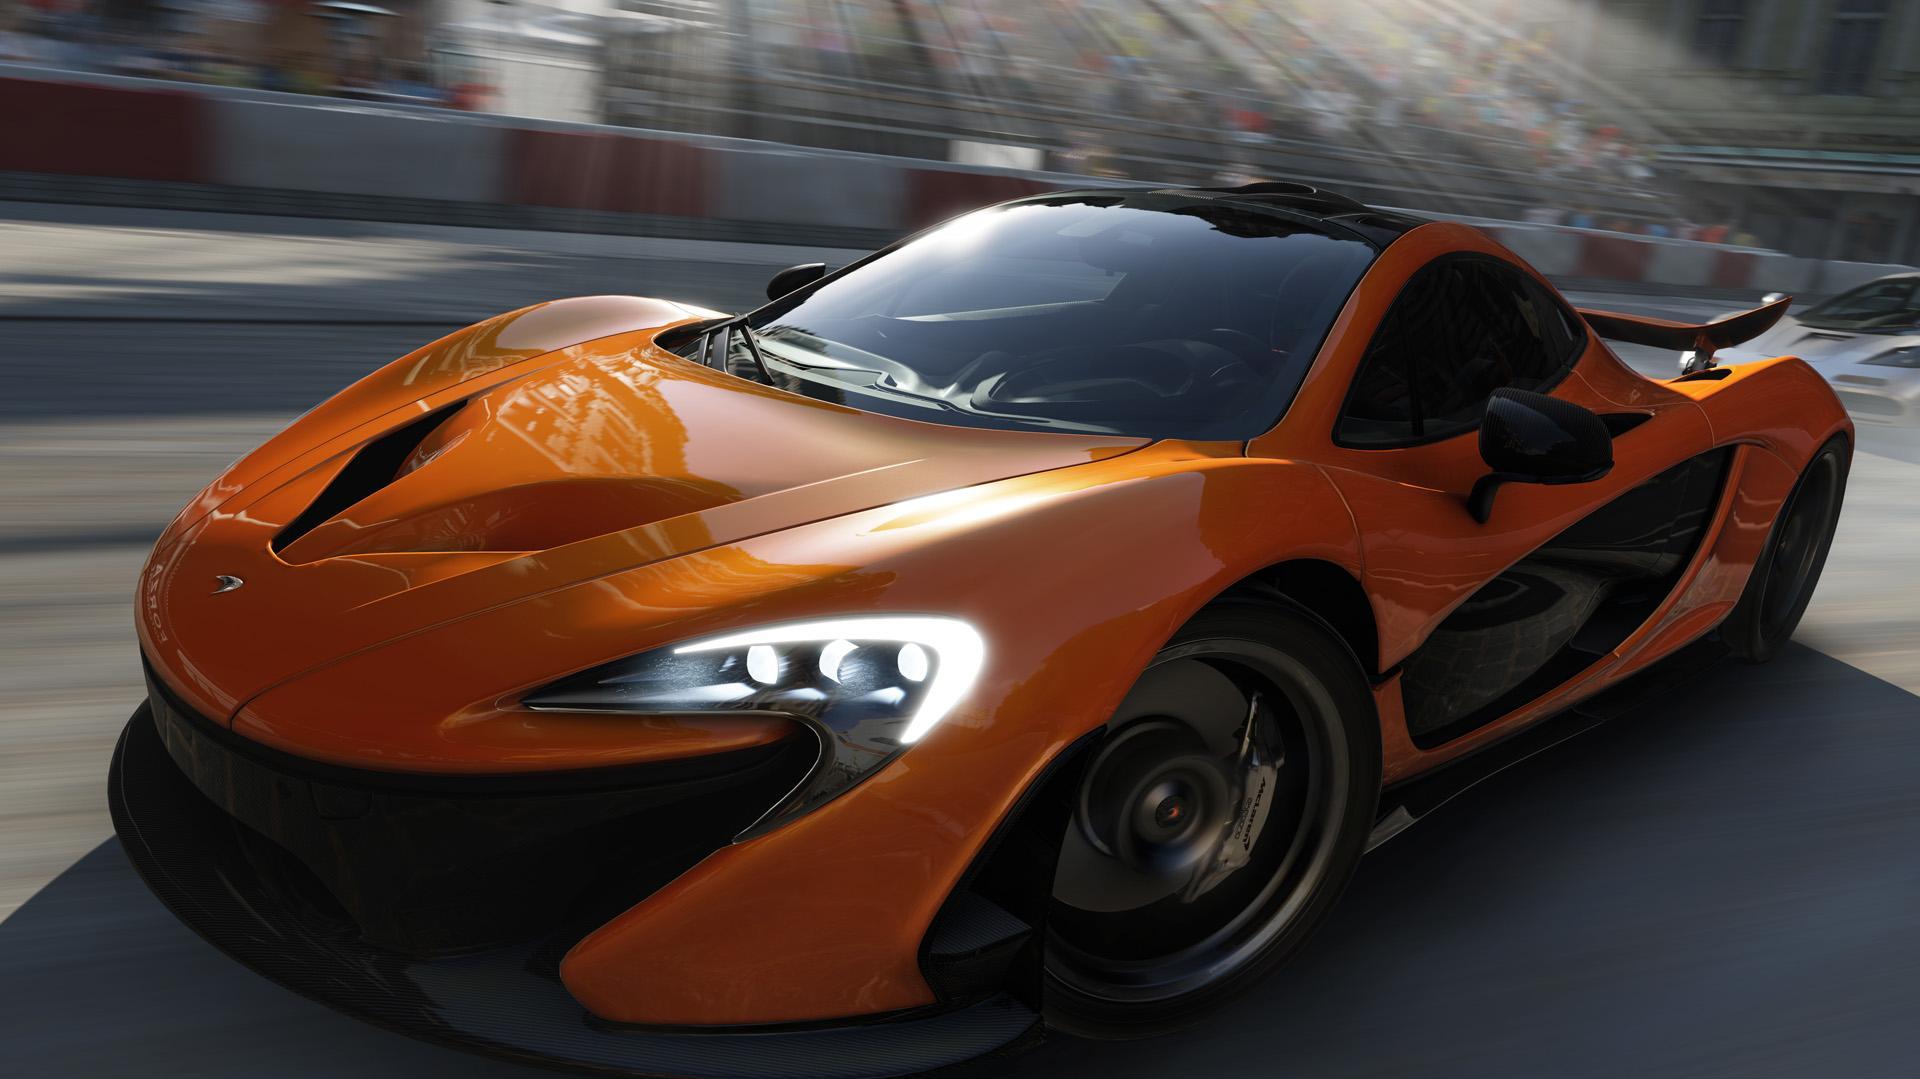 Forza Gameplay Cruising in a Ferrari - Gamescom 2013